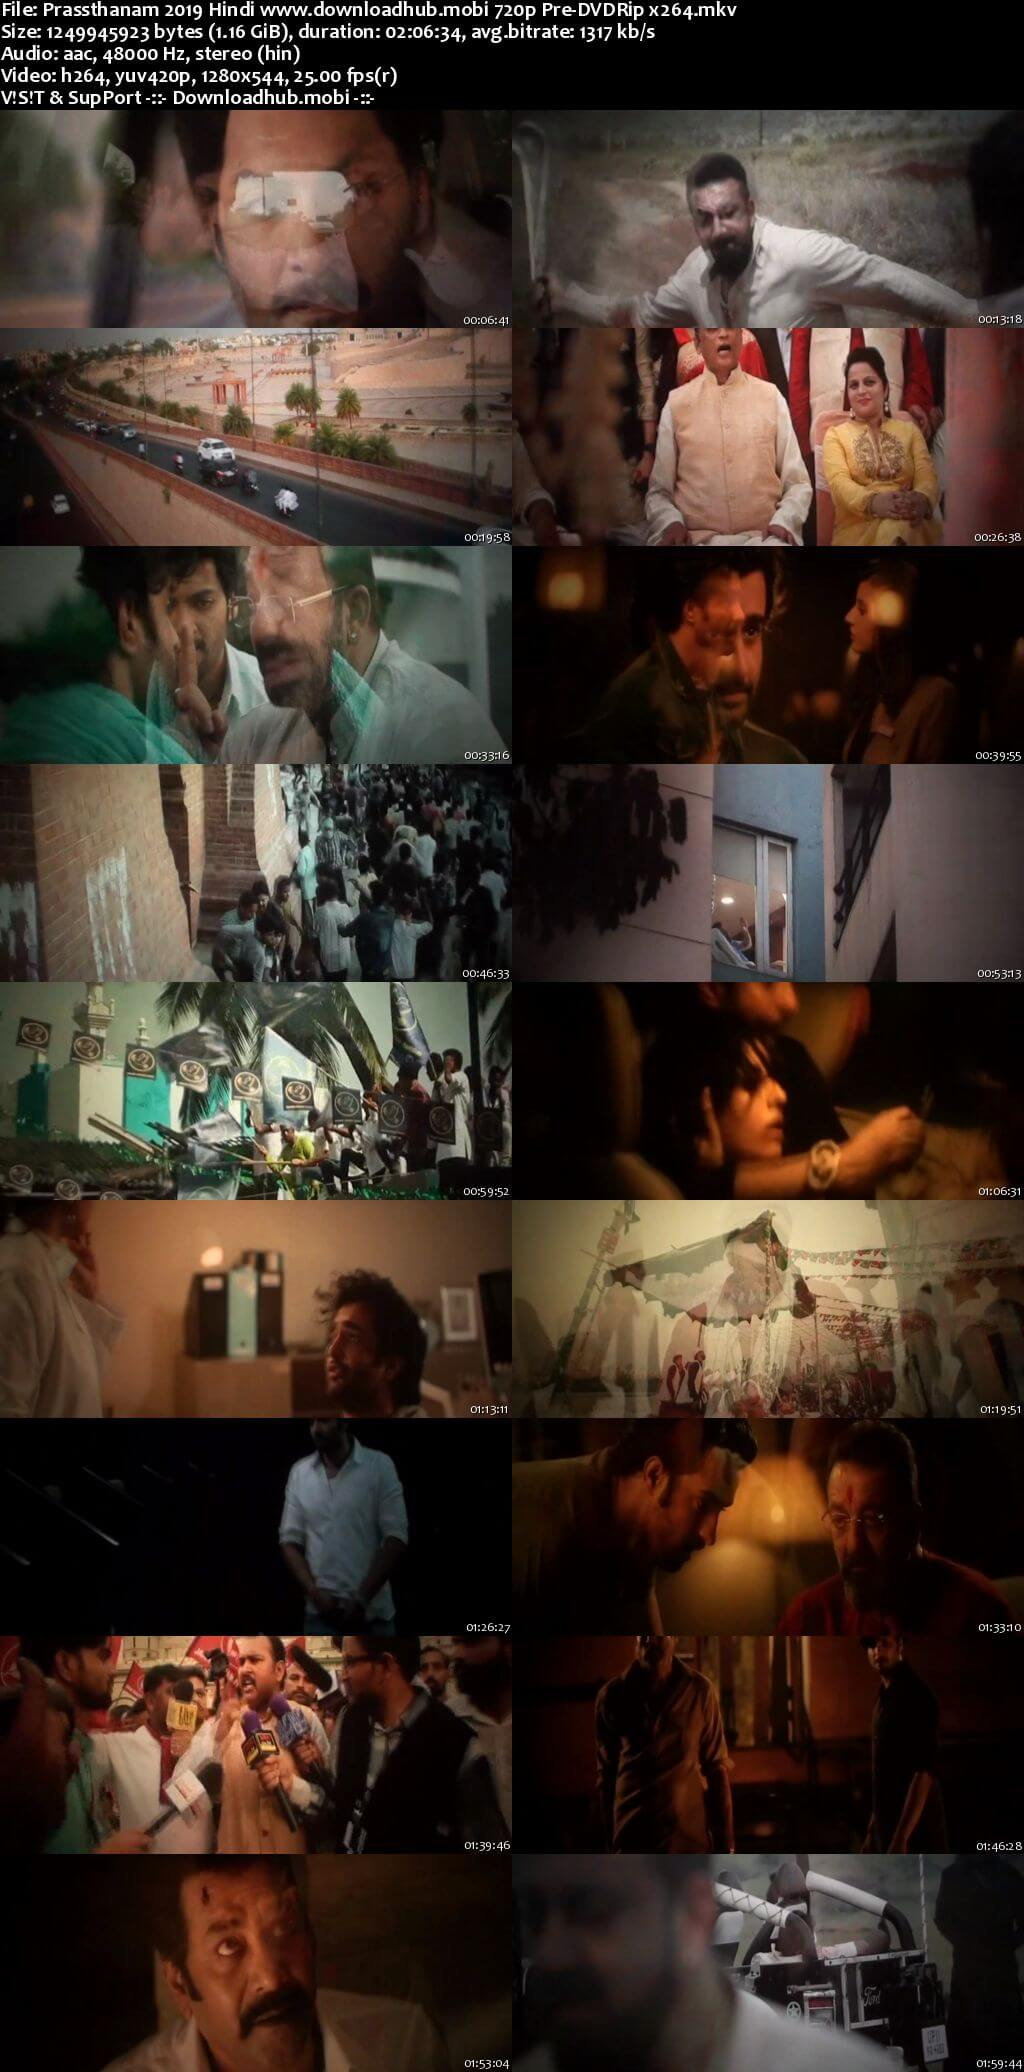 Prassthanam 2019 Hindi 720p Pre-DVDRip x264